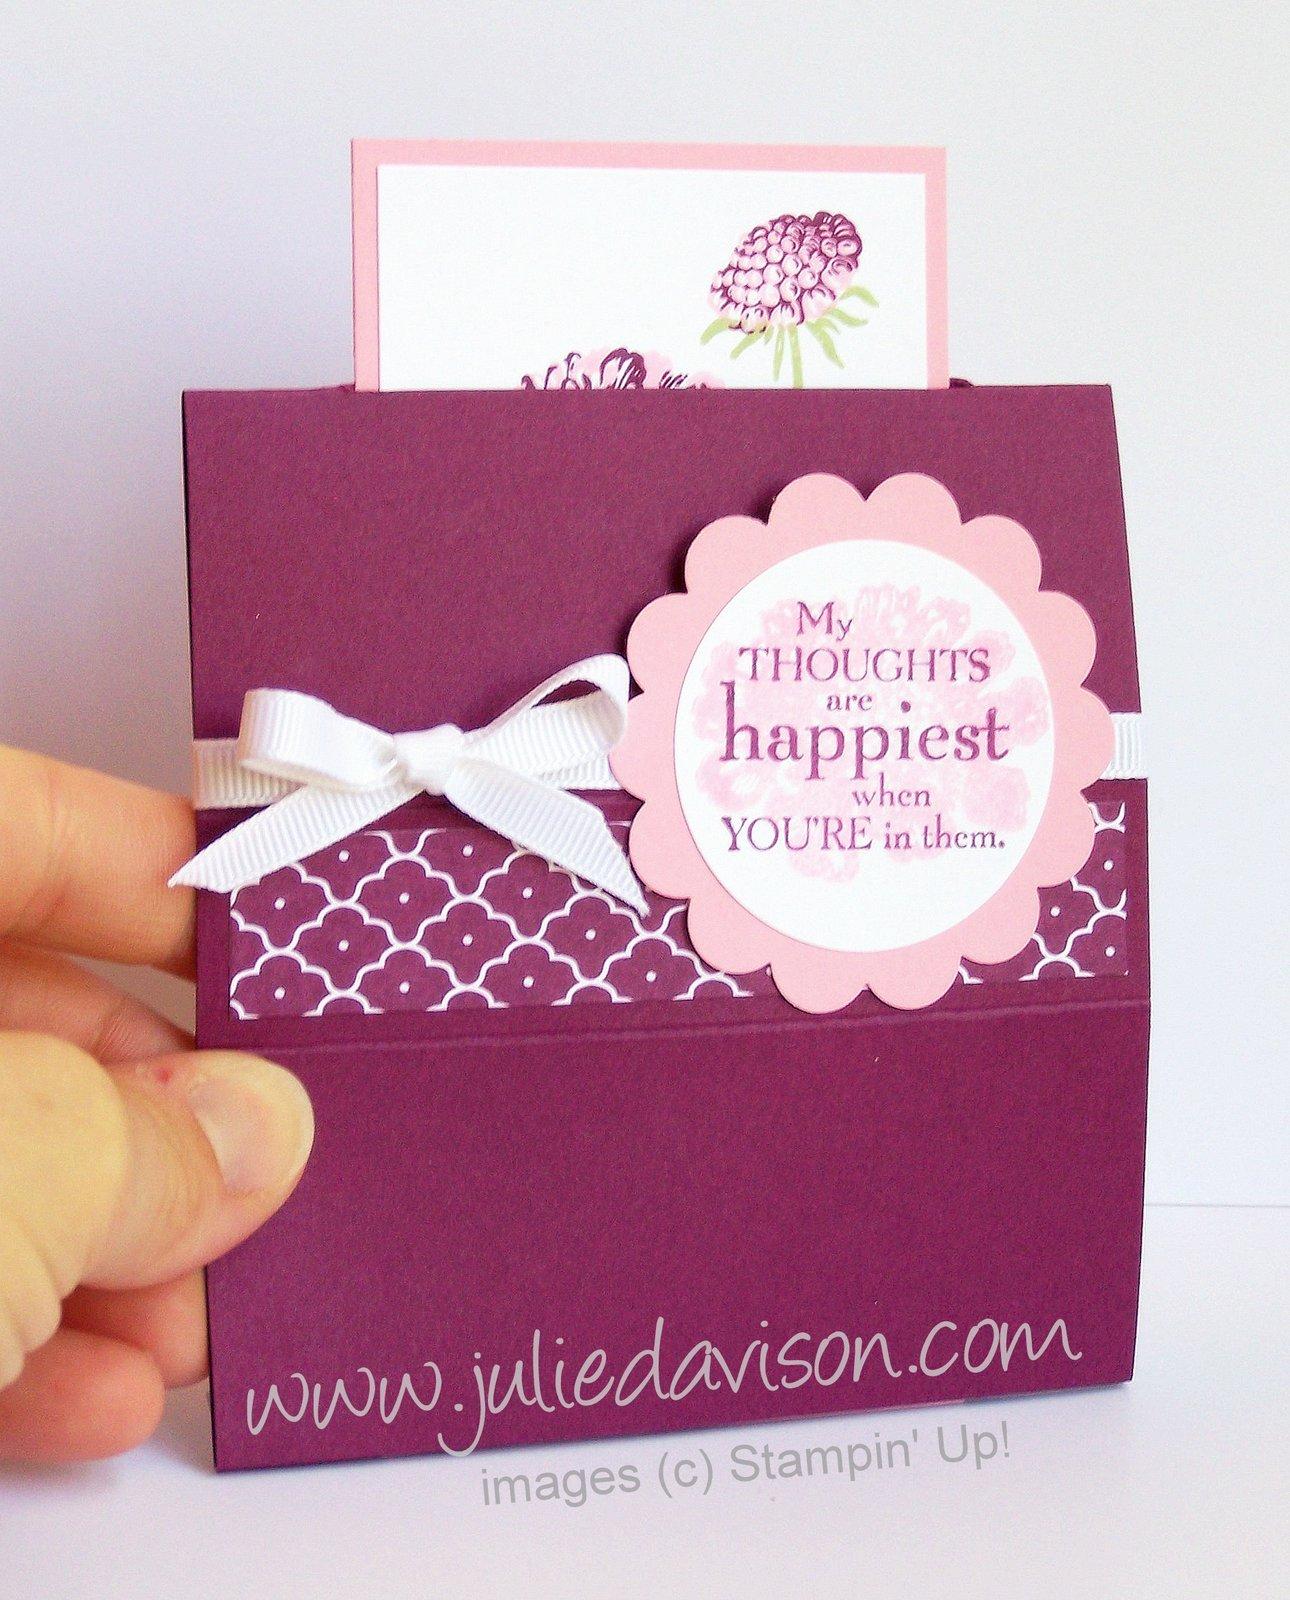 Julies Stamping Spot Stampin Up Project Ideas By Julie Davison